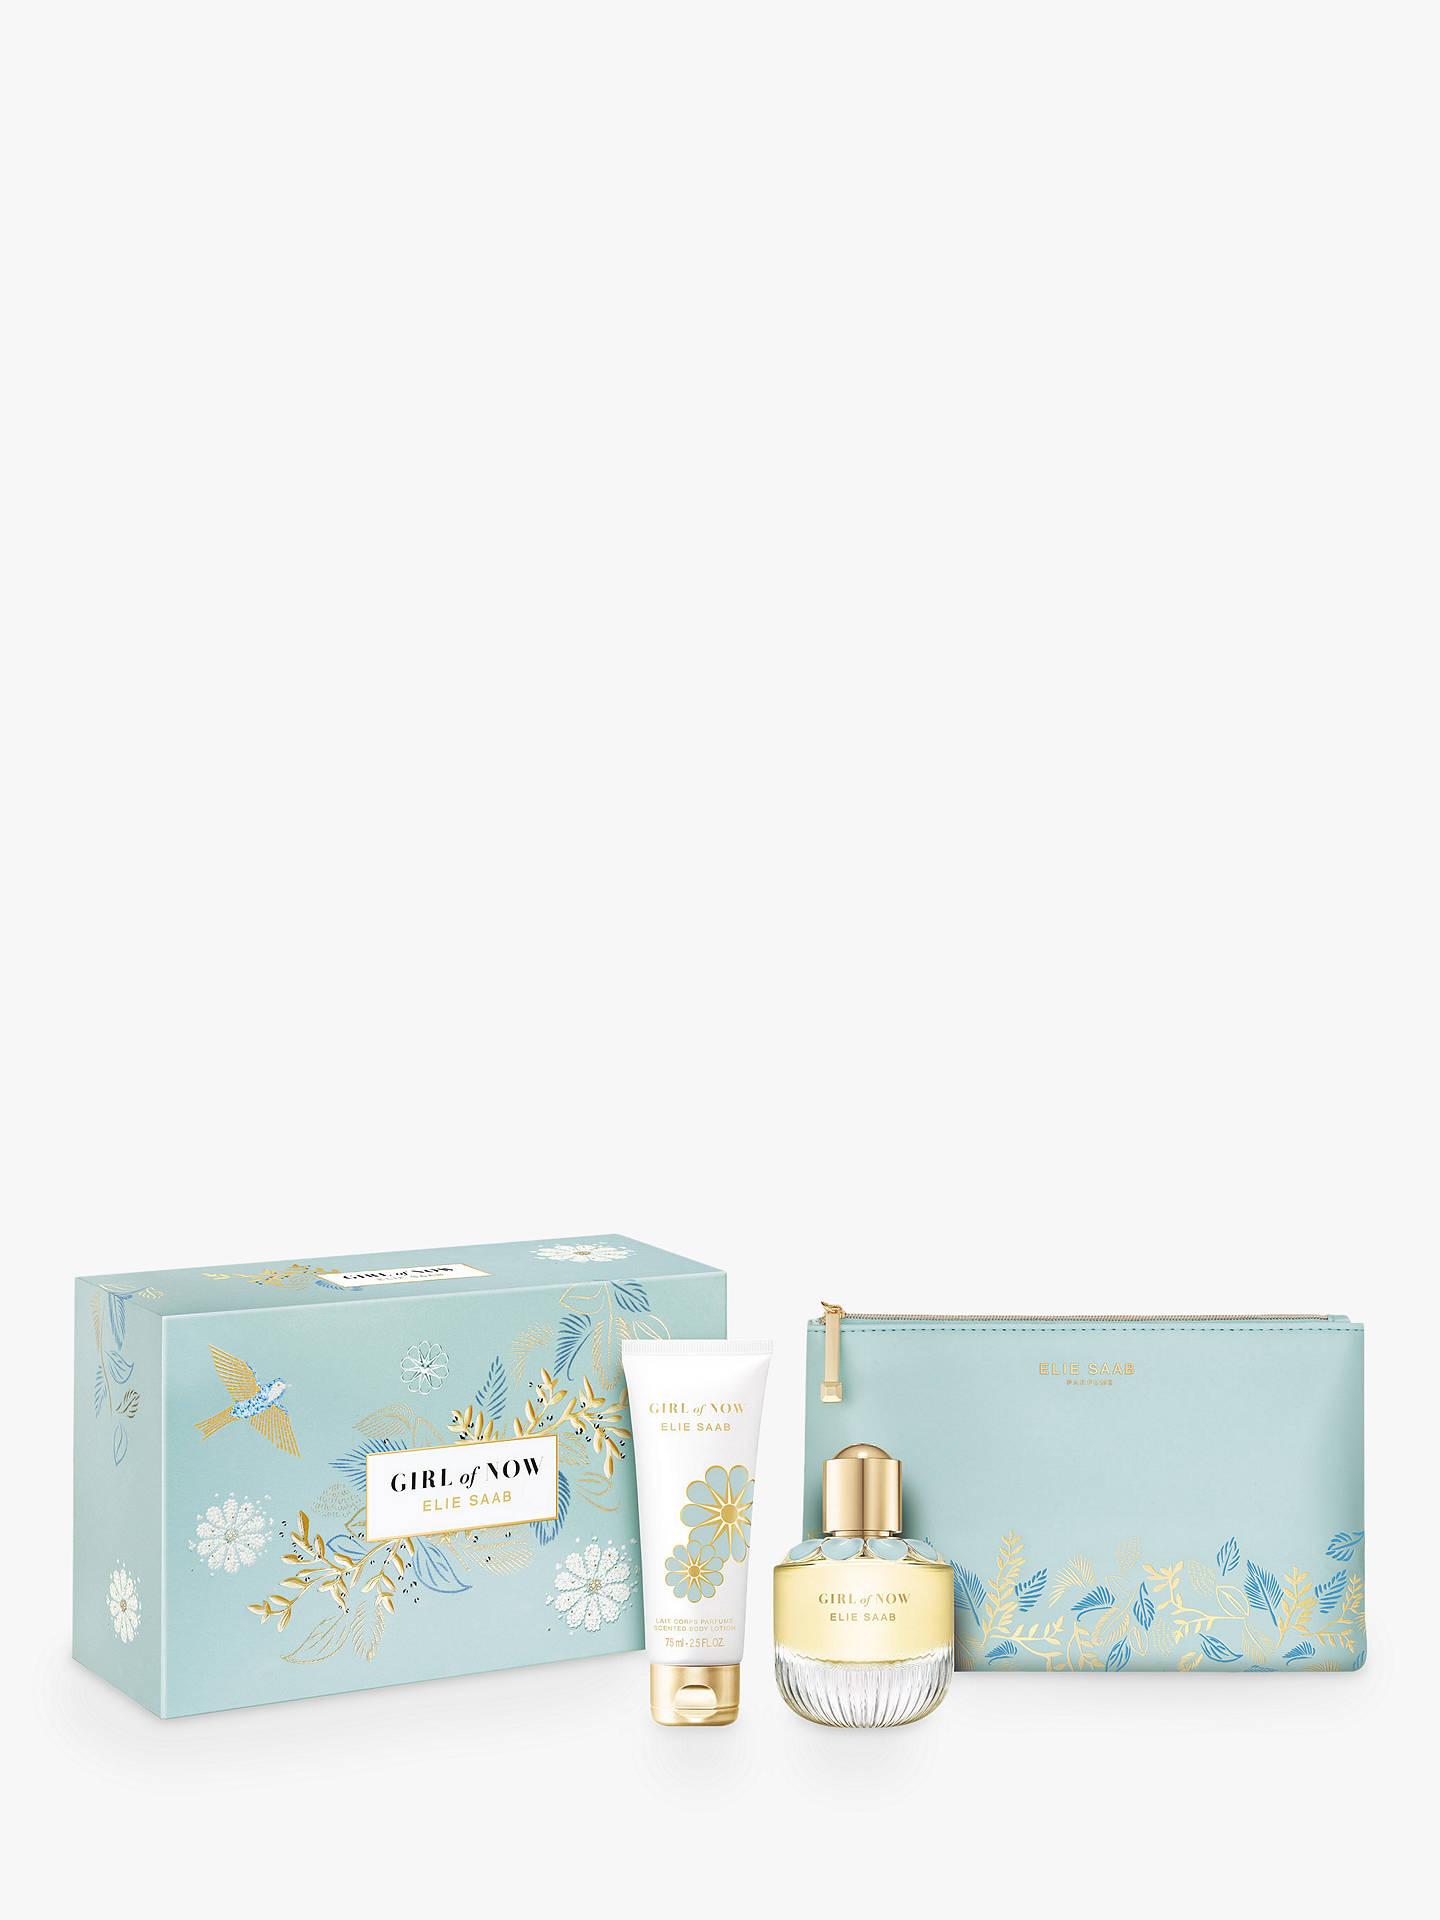 576b3d296d4e1 Buy Elie Saab Girl of Now Eau de Parfum 50ml Mother s Day Fragrance Gift  Set Online